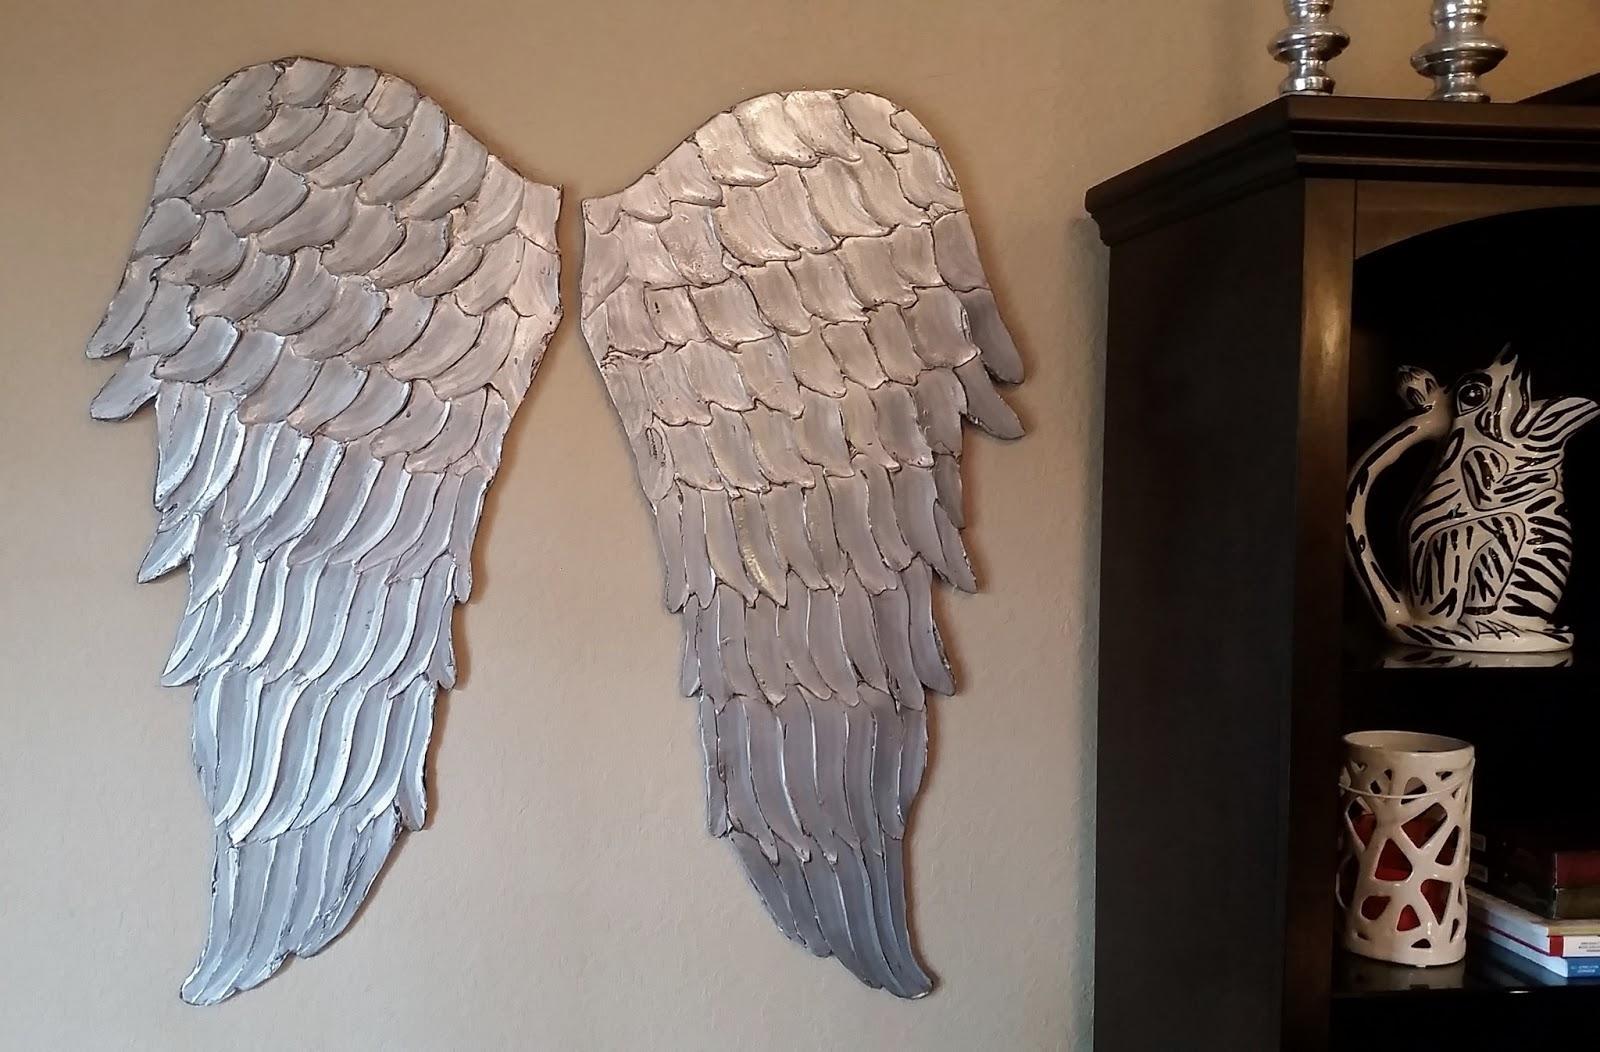 Wood Angel Wings Wall Art, Large Carved Look Wooden Angel Wings Throughout Angel Wing Wall Art (Image 19 of 20)